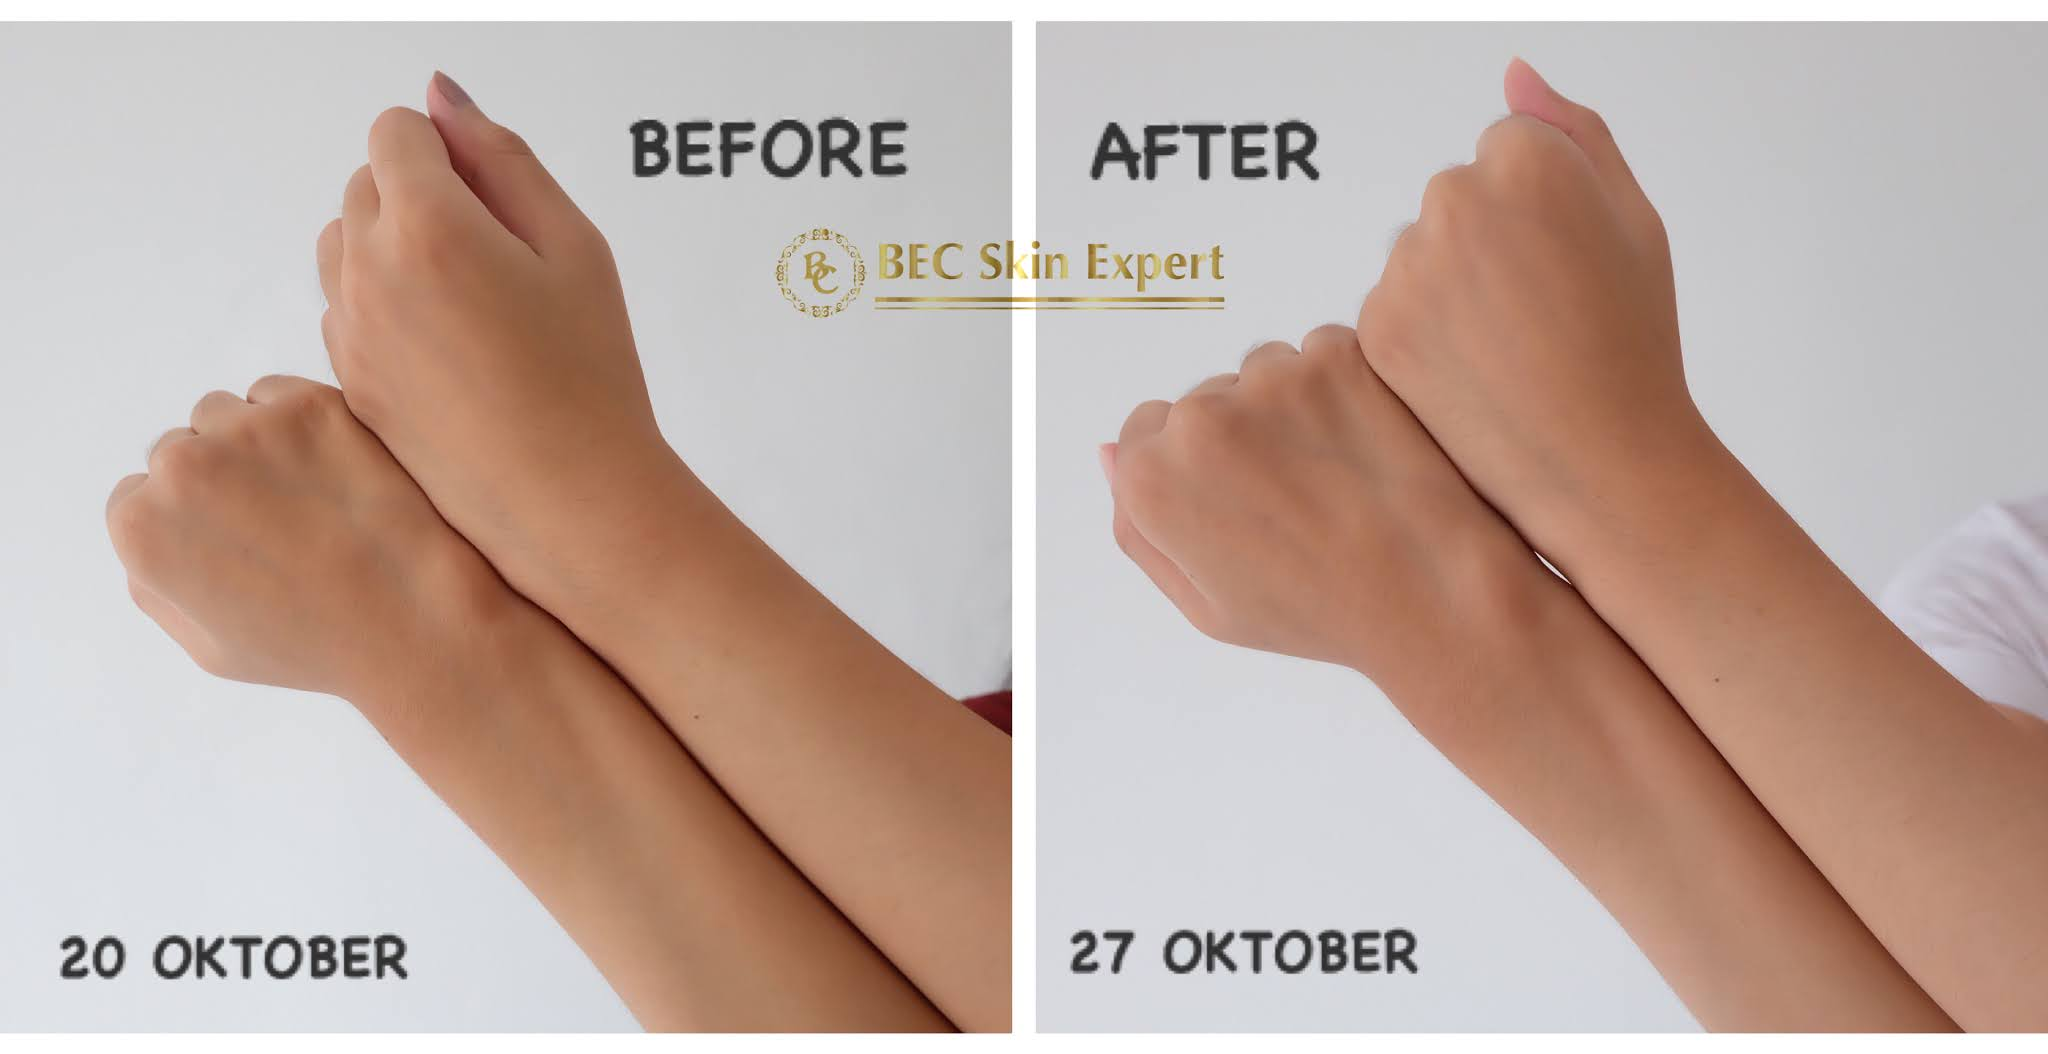 Before After Penggunaan BEC Skin Expert